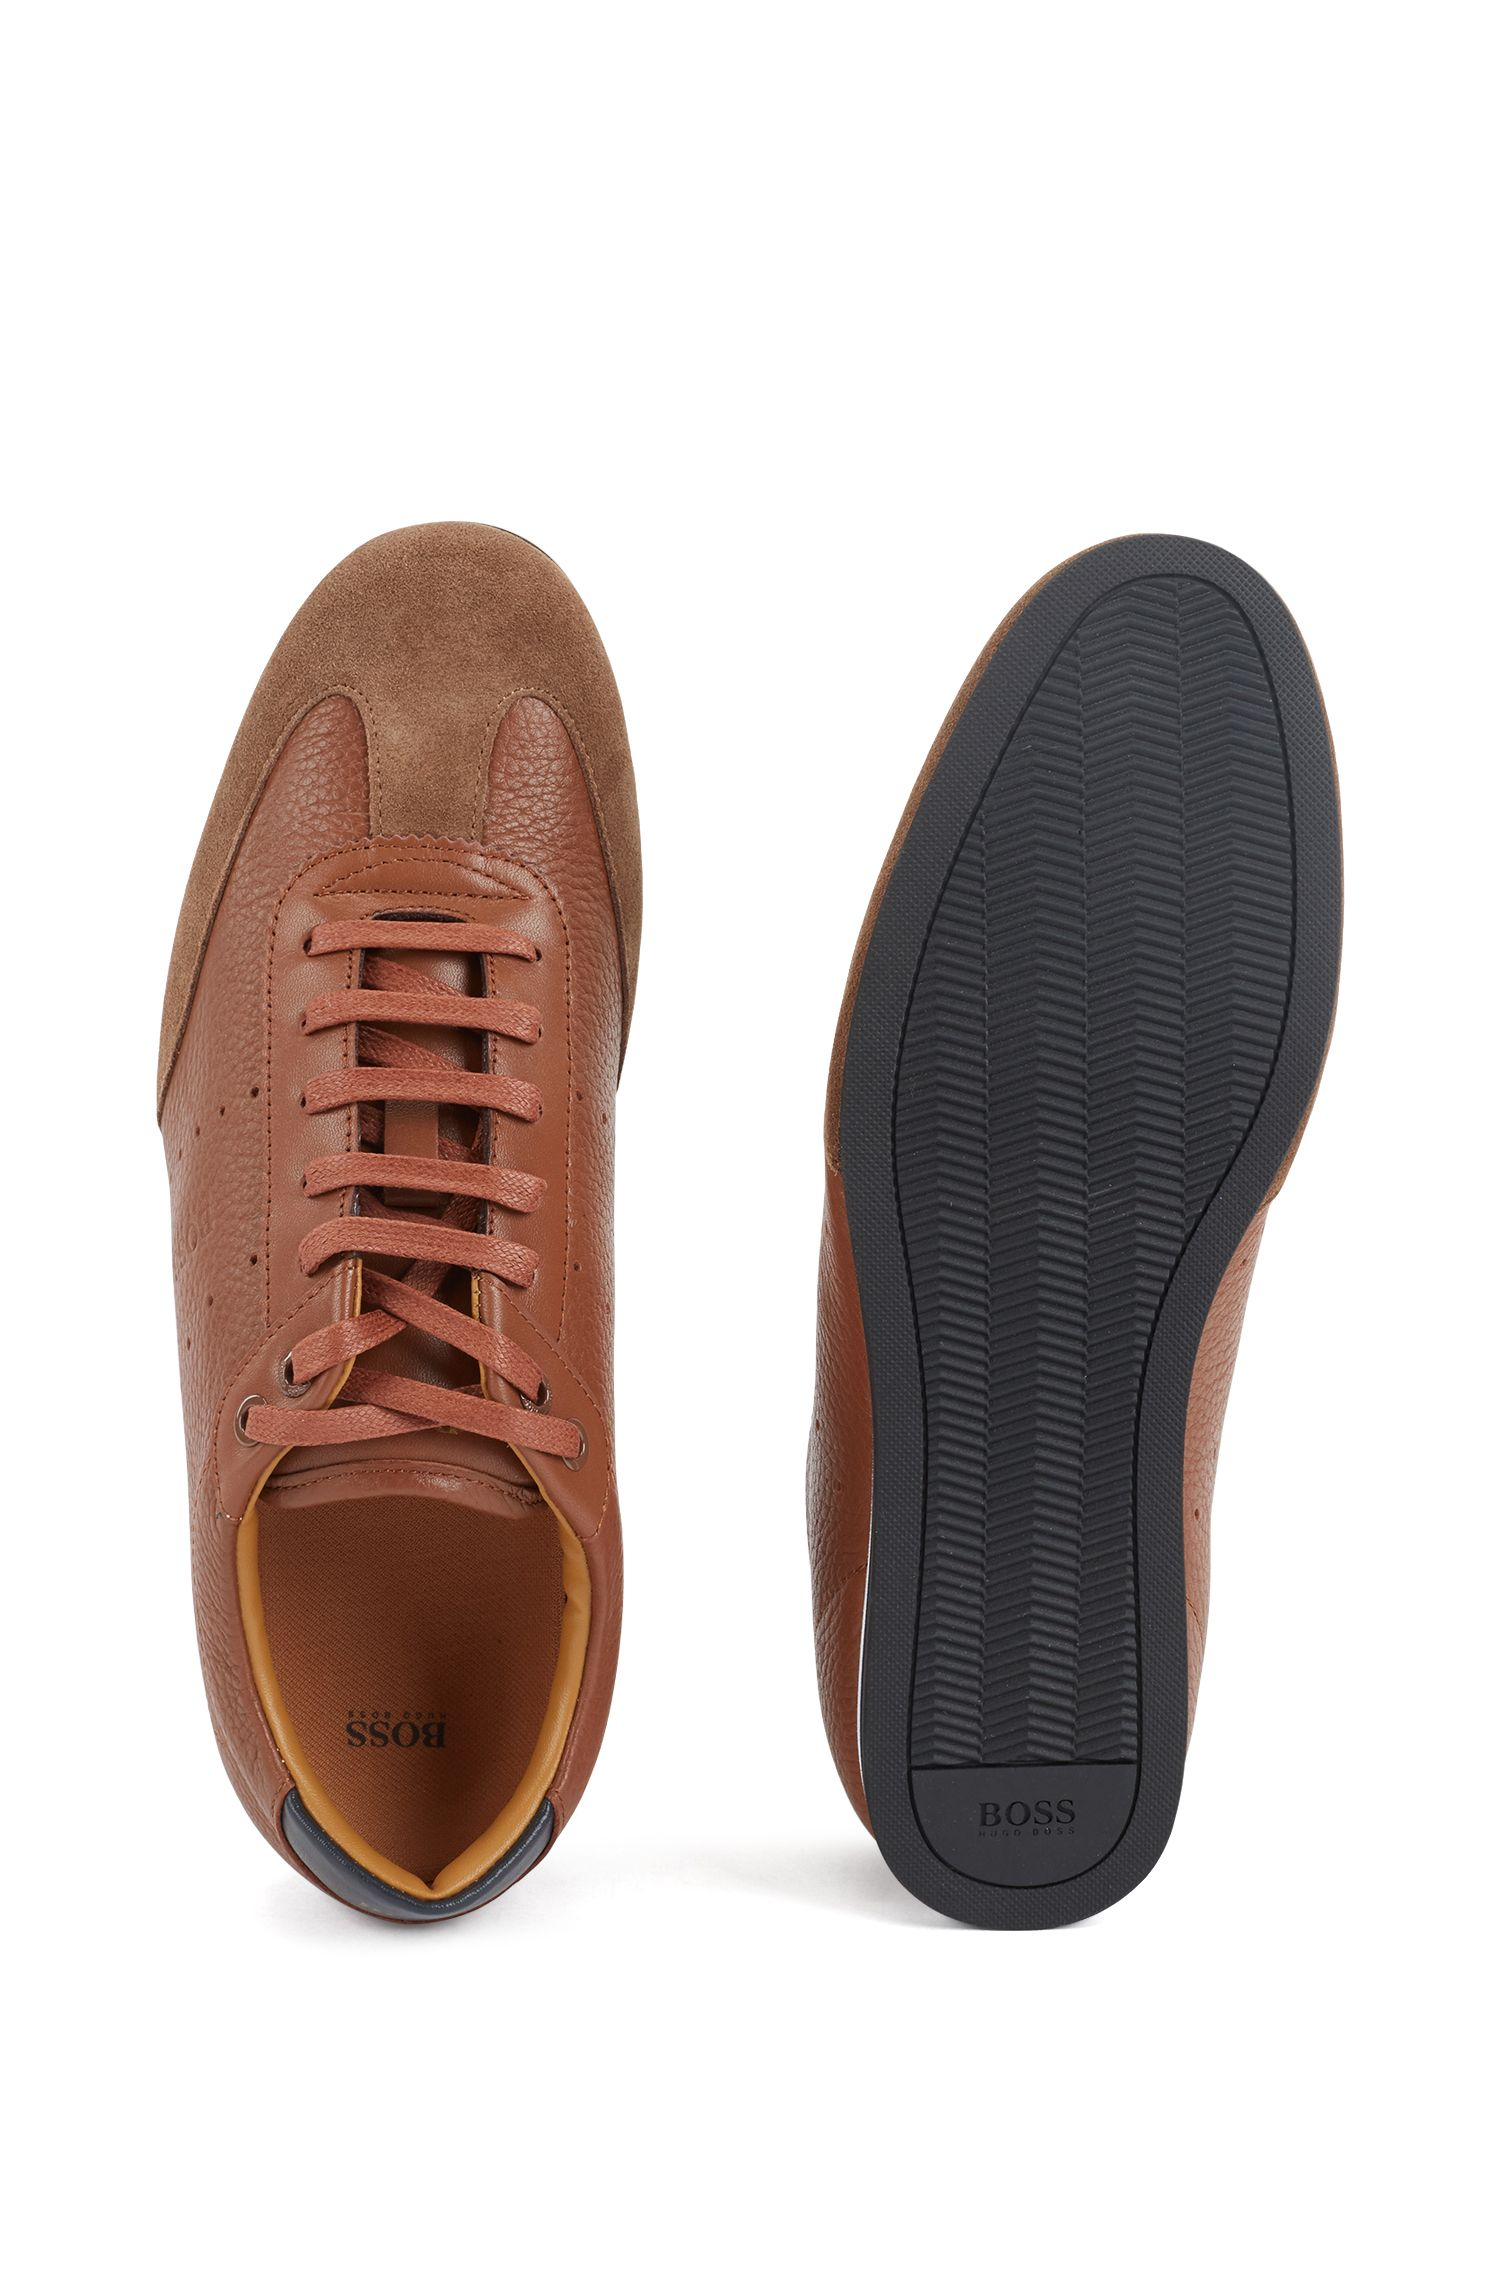 Hugo Boss - Lowtop Sneakers aus Veloursleder und gewalktem Leder - 5